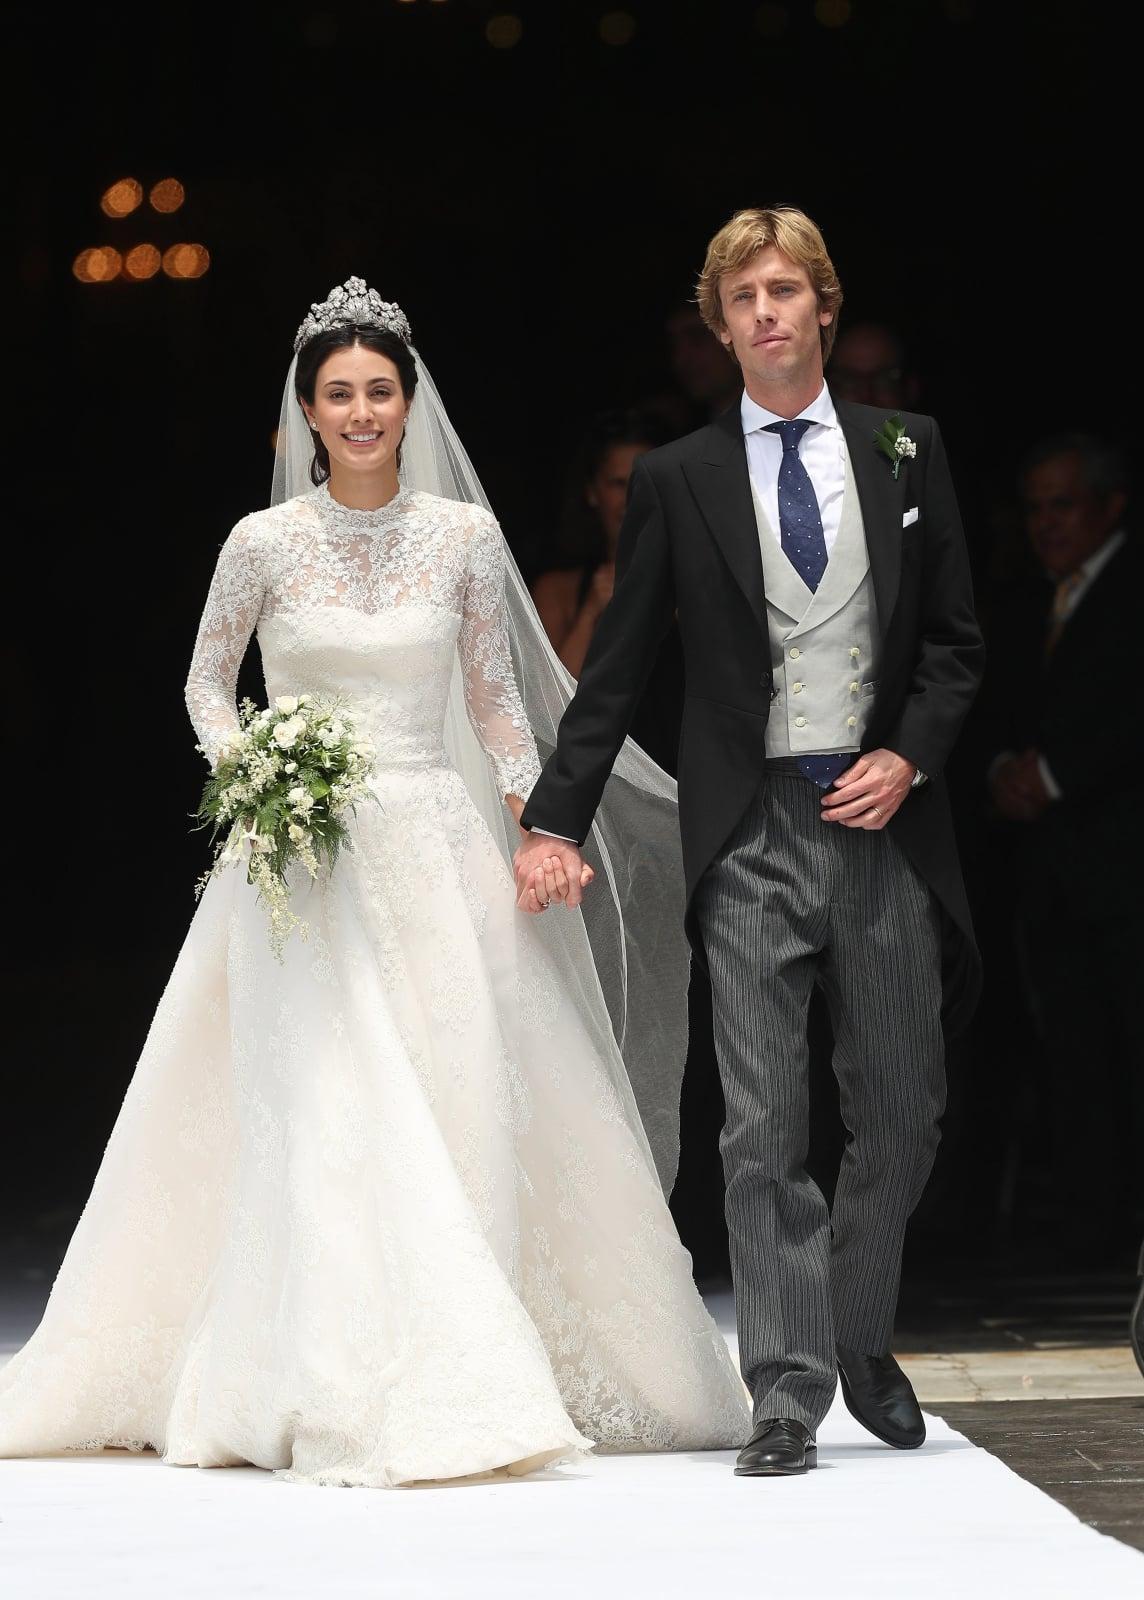 Ślub księcia Christiana EPA/ERNESTO ARIAS